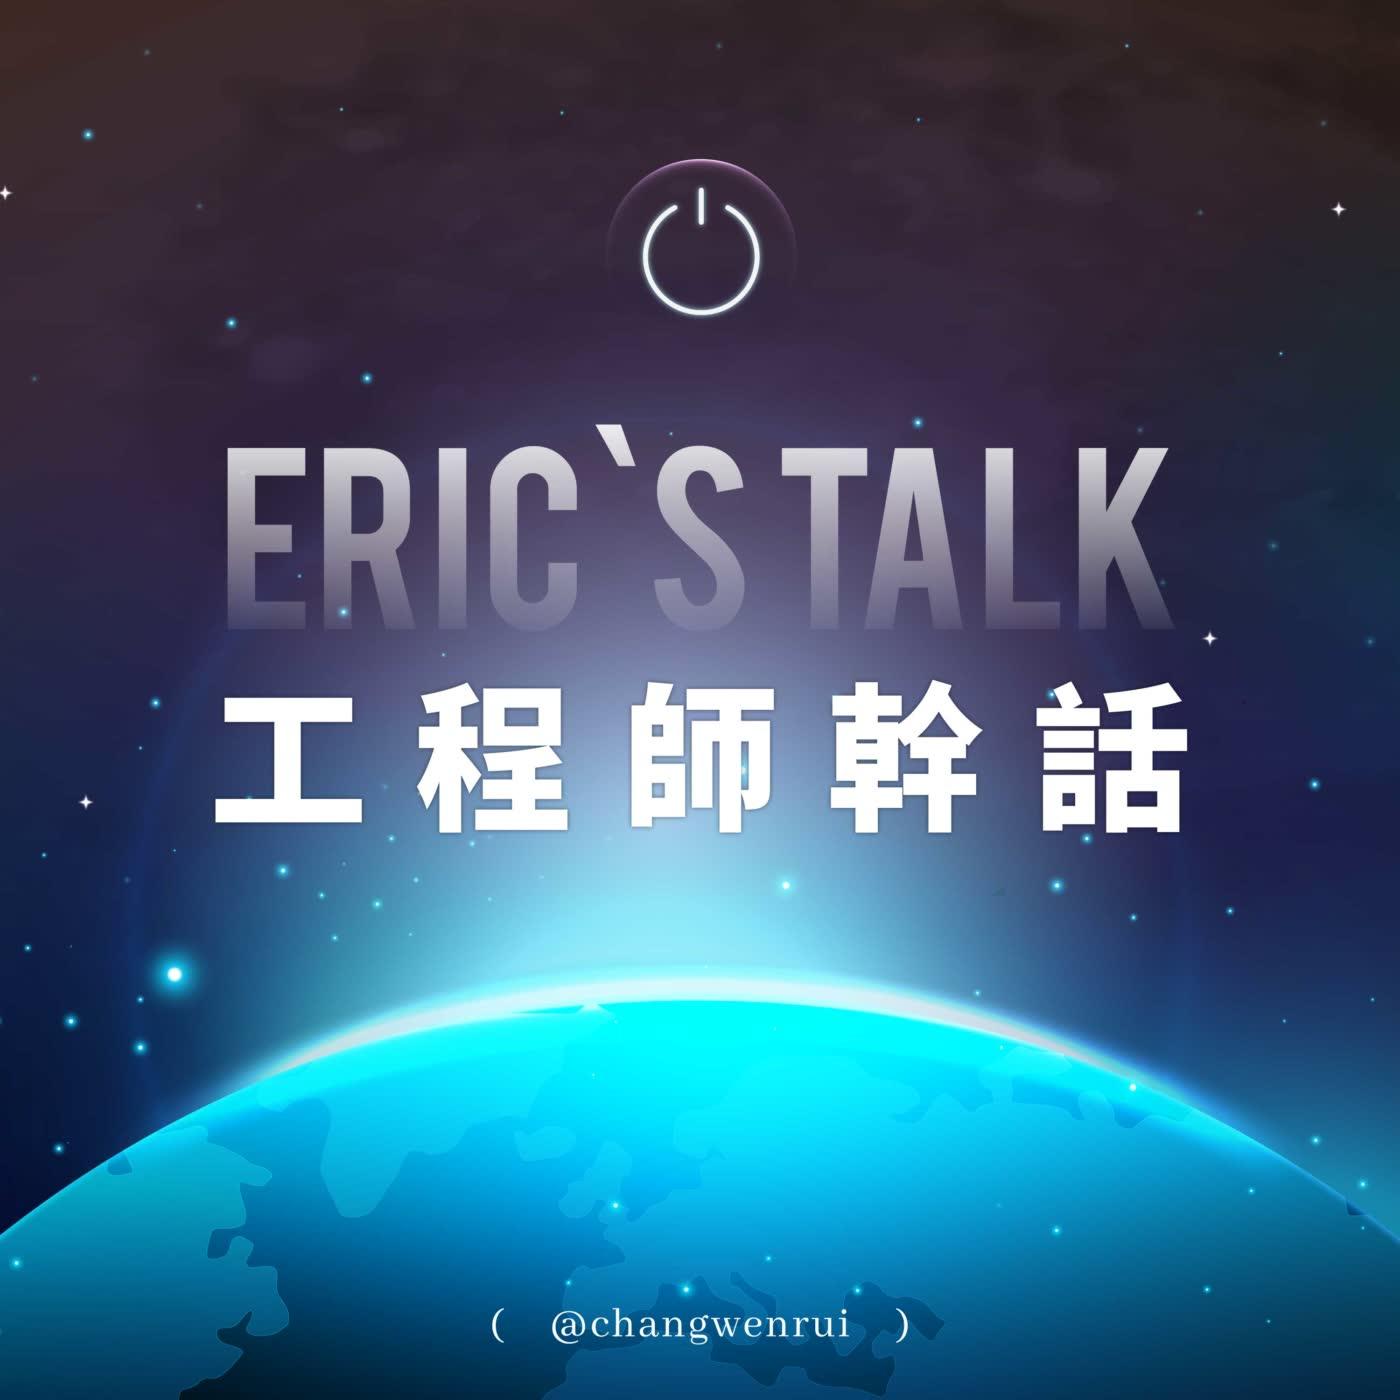 Eric's Talk 工程師幹話